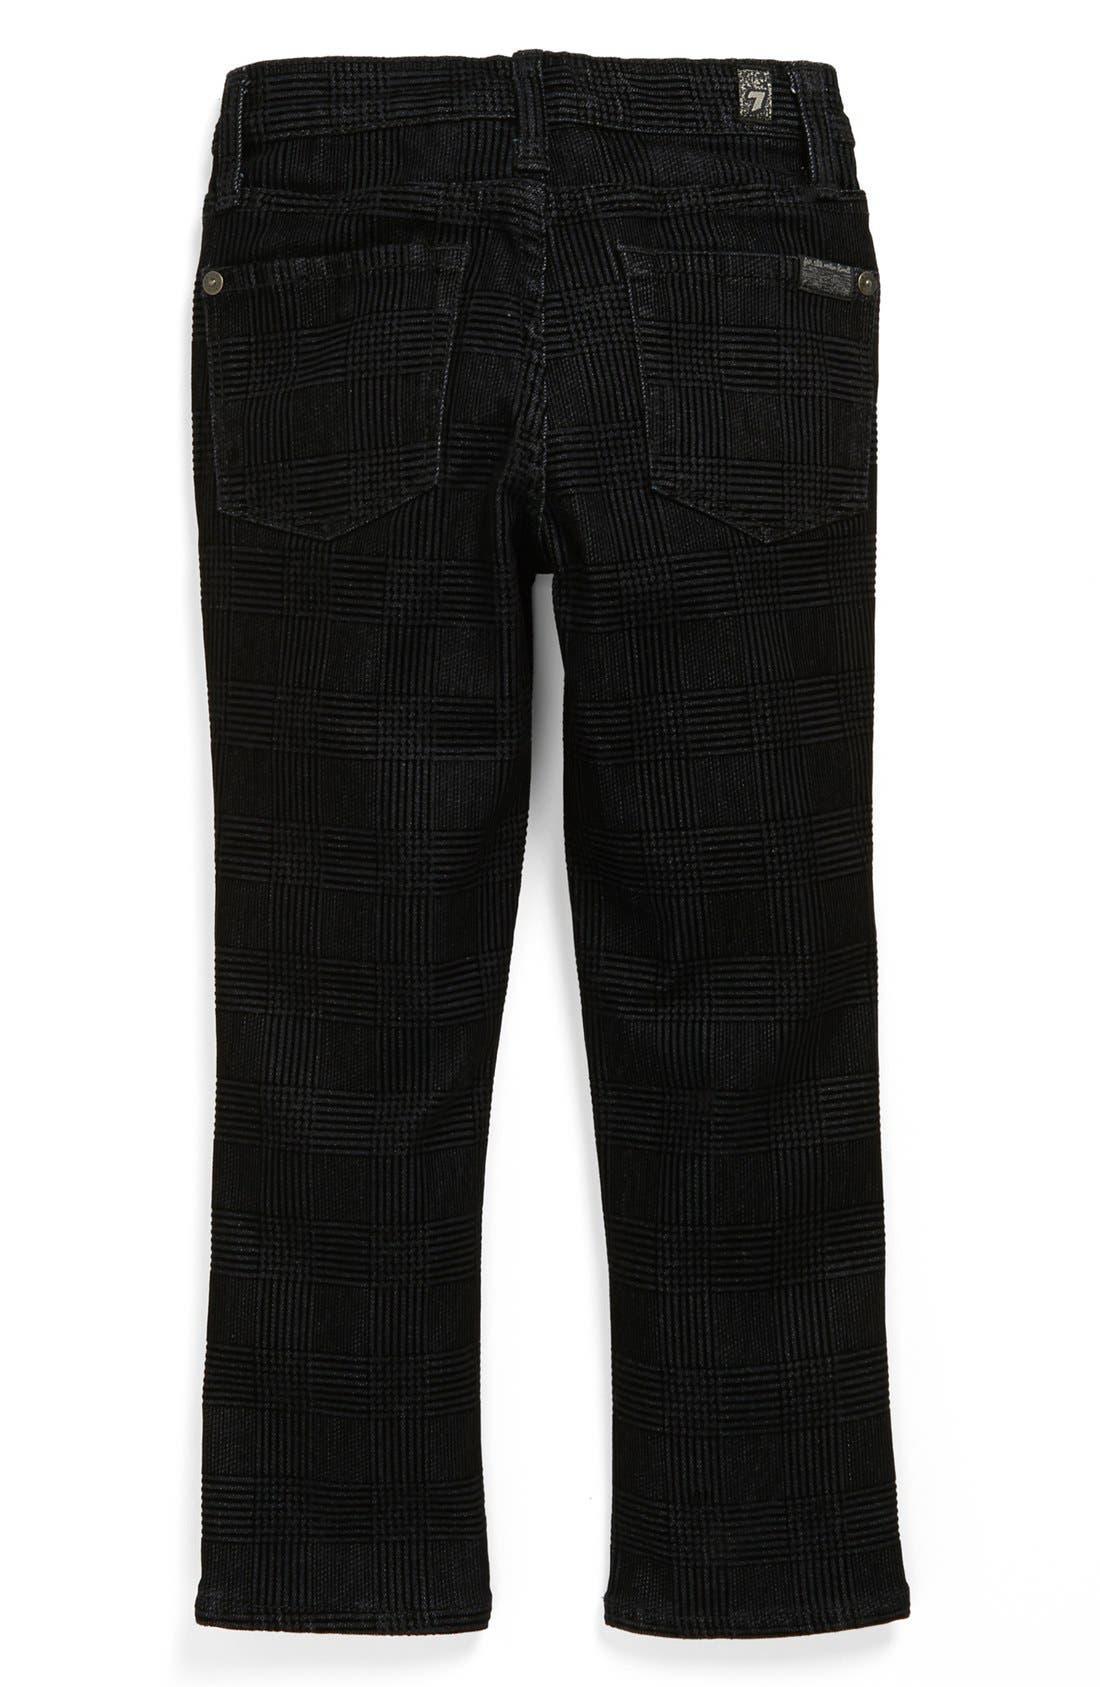 Alternate Image 1 Selected - 7 For All Mankind® 'Slimmy' Flocked Slim Fit Jeans (Toddler Boys)